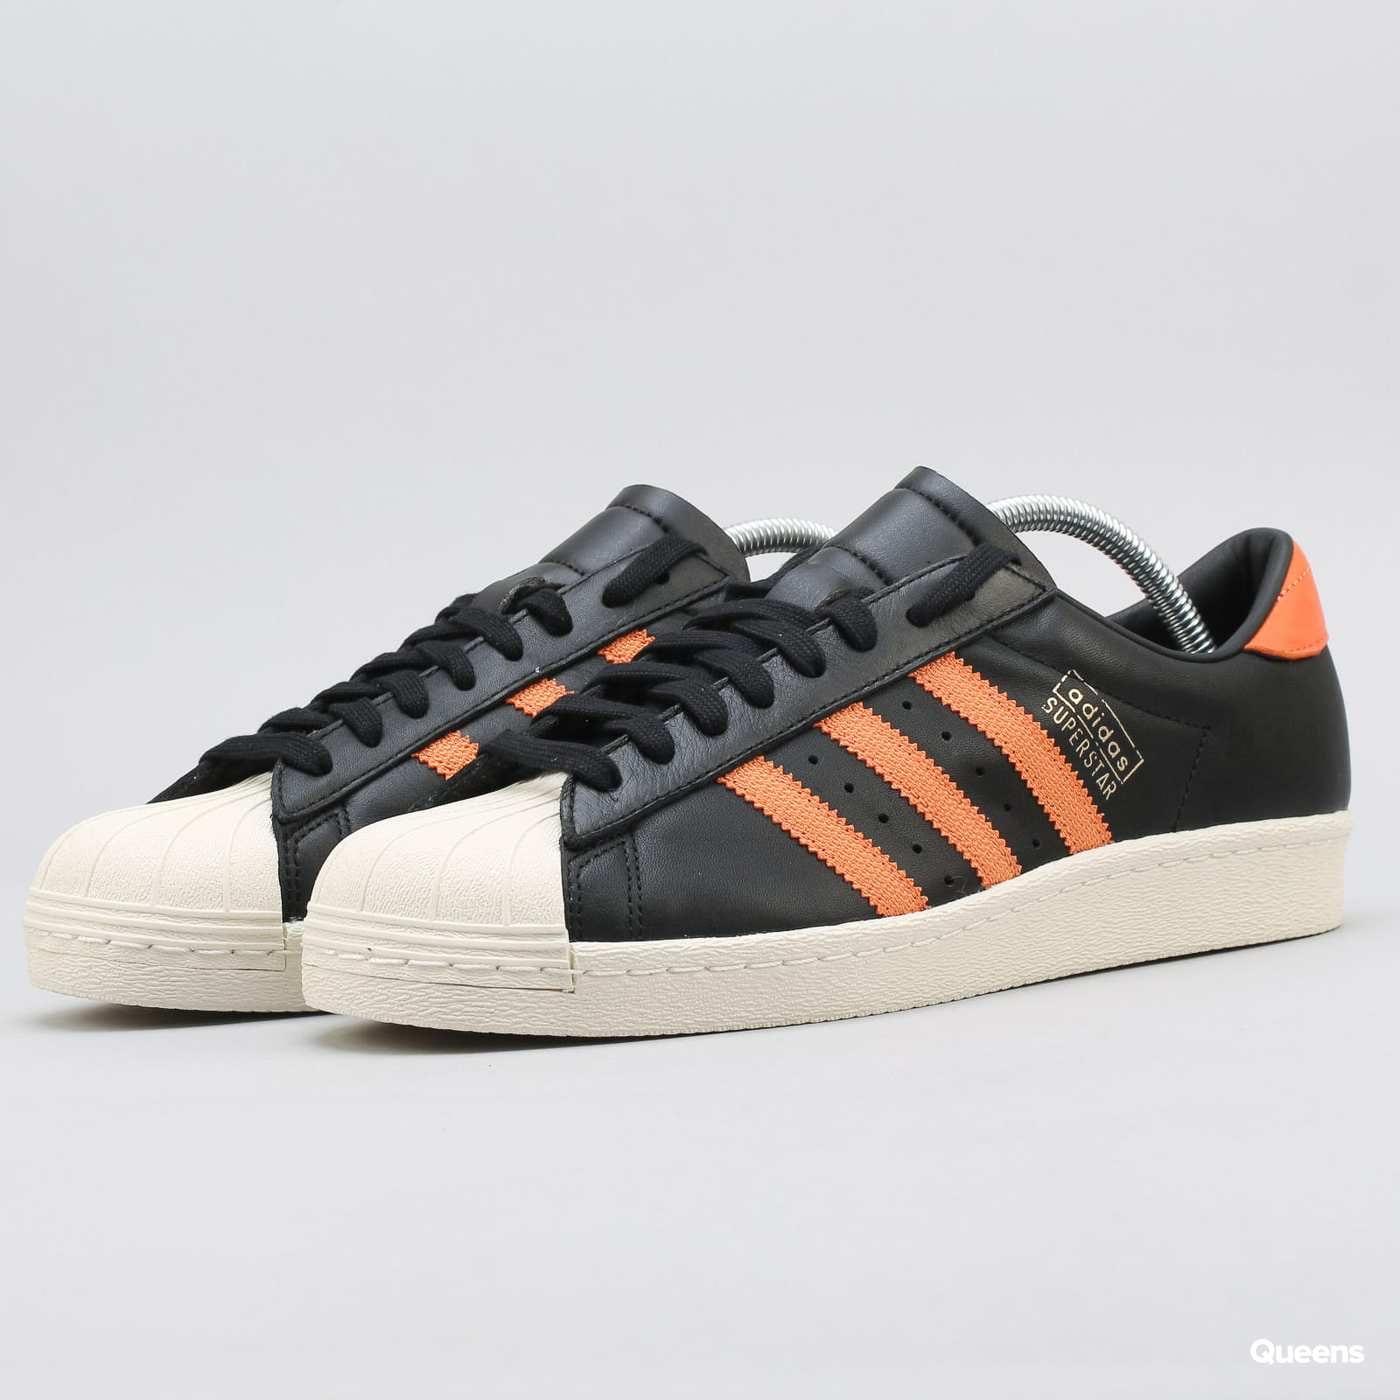 Boty adidas Superstar OG (CQ2478) – Queens 💚 7192ff74c1